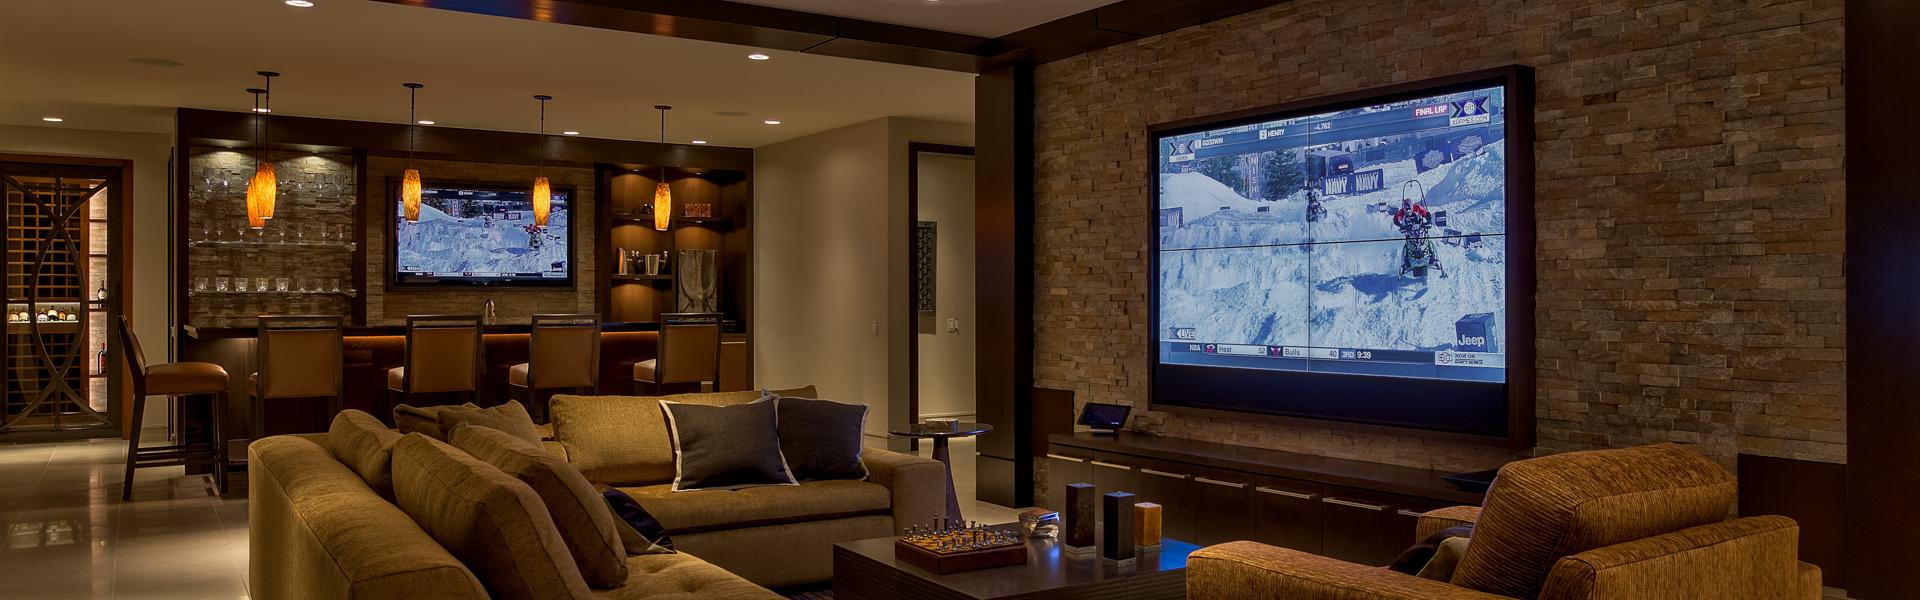 Smart home installation by Echo Systems for Okoboji